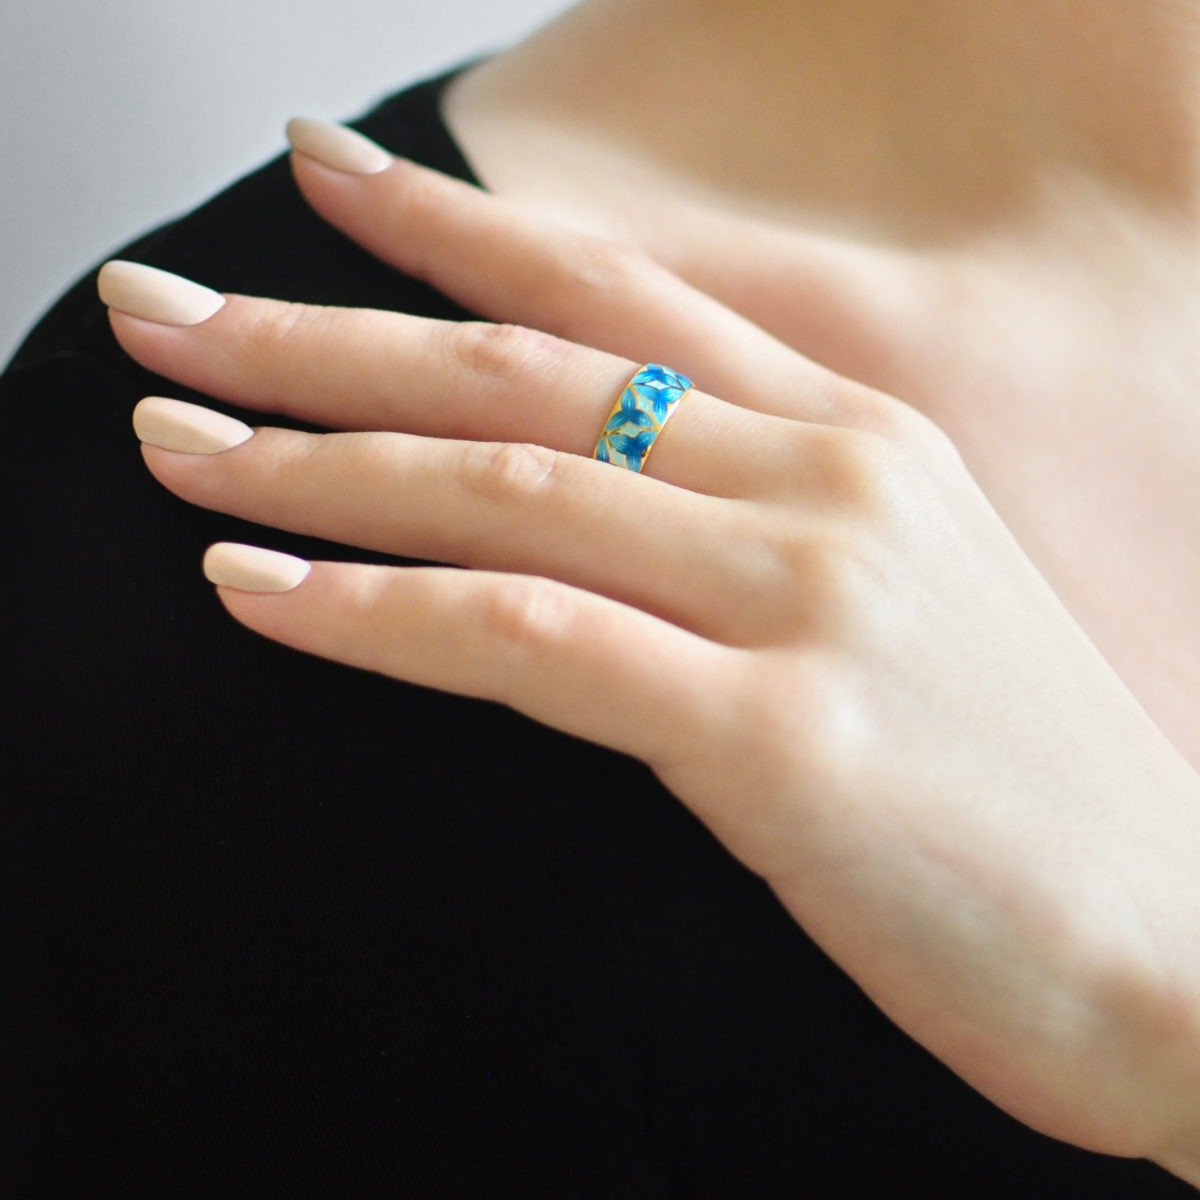 Zolochenie sinyaya 13 1200x1200 - Кольцо из серебра «Трилистник» (золочение), синее